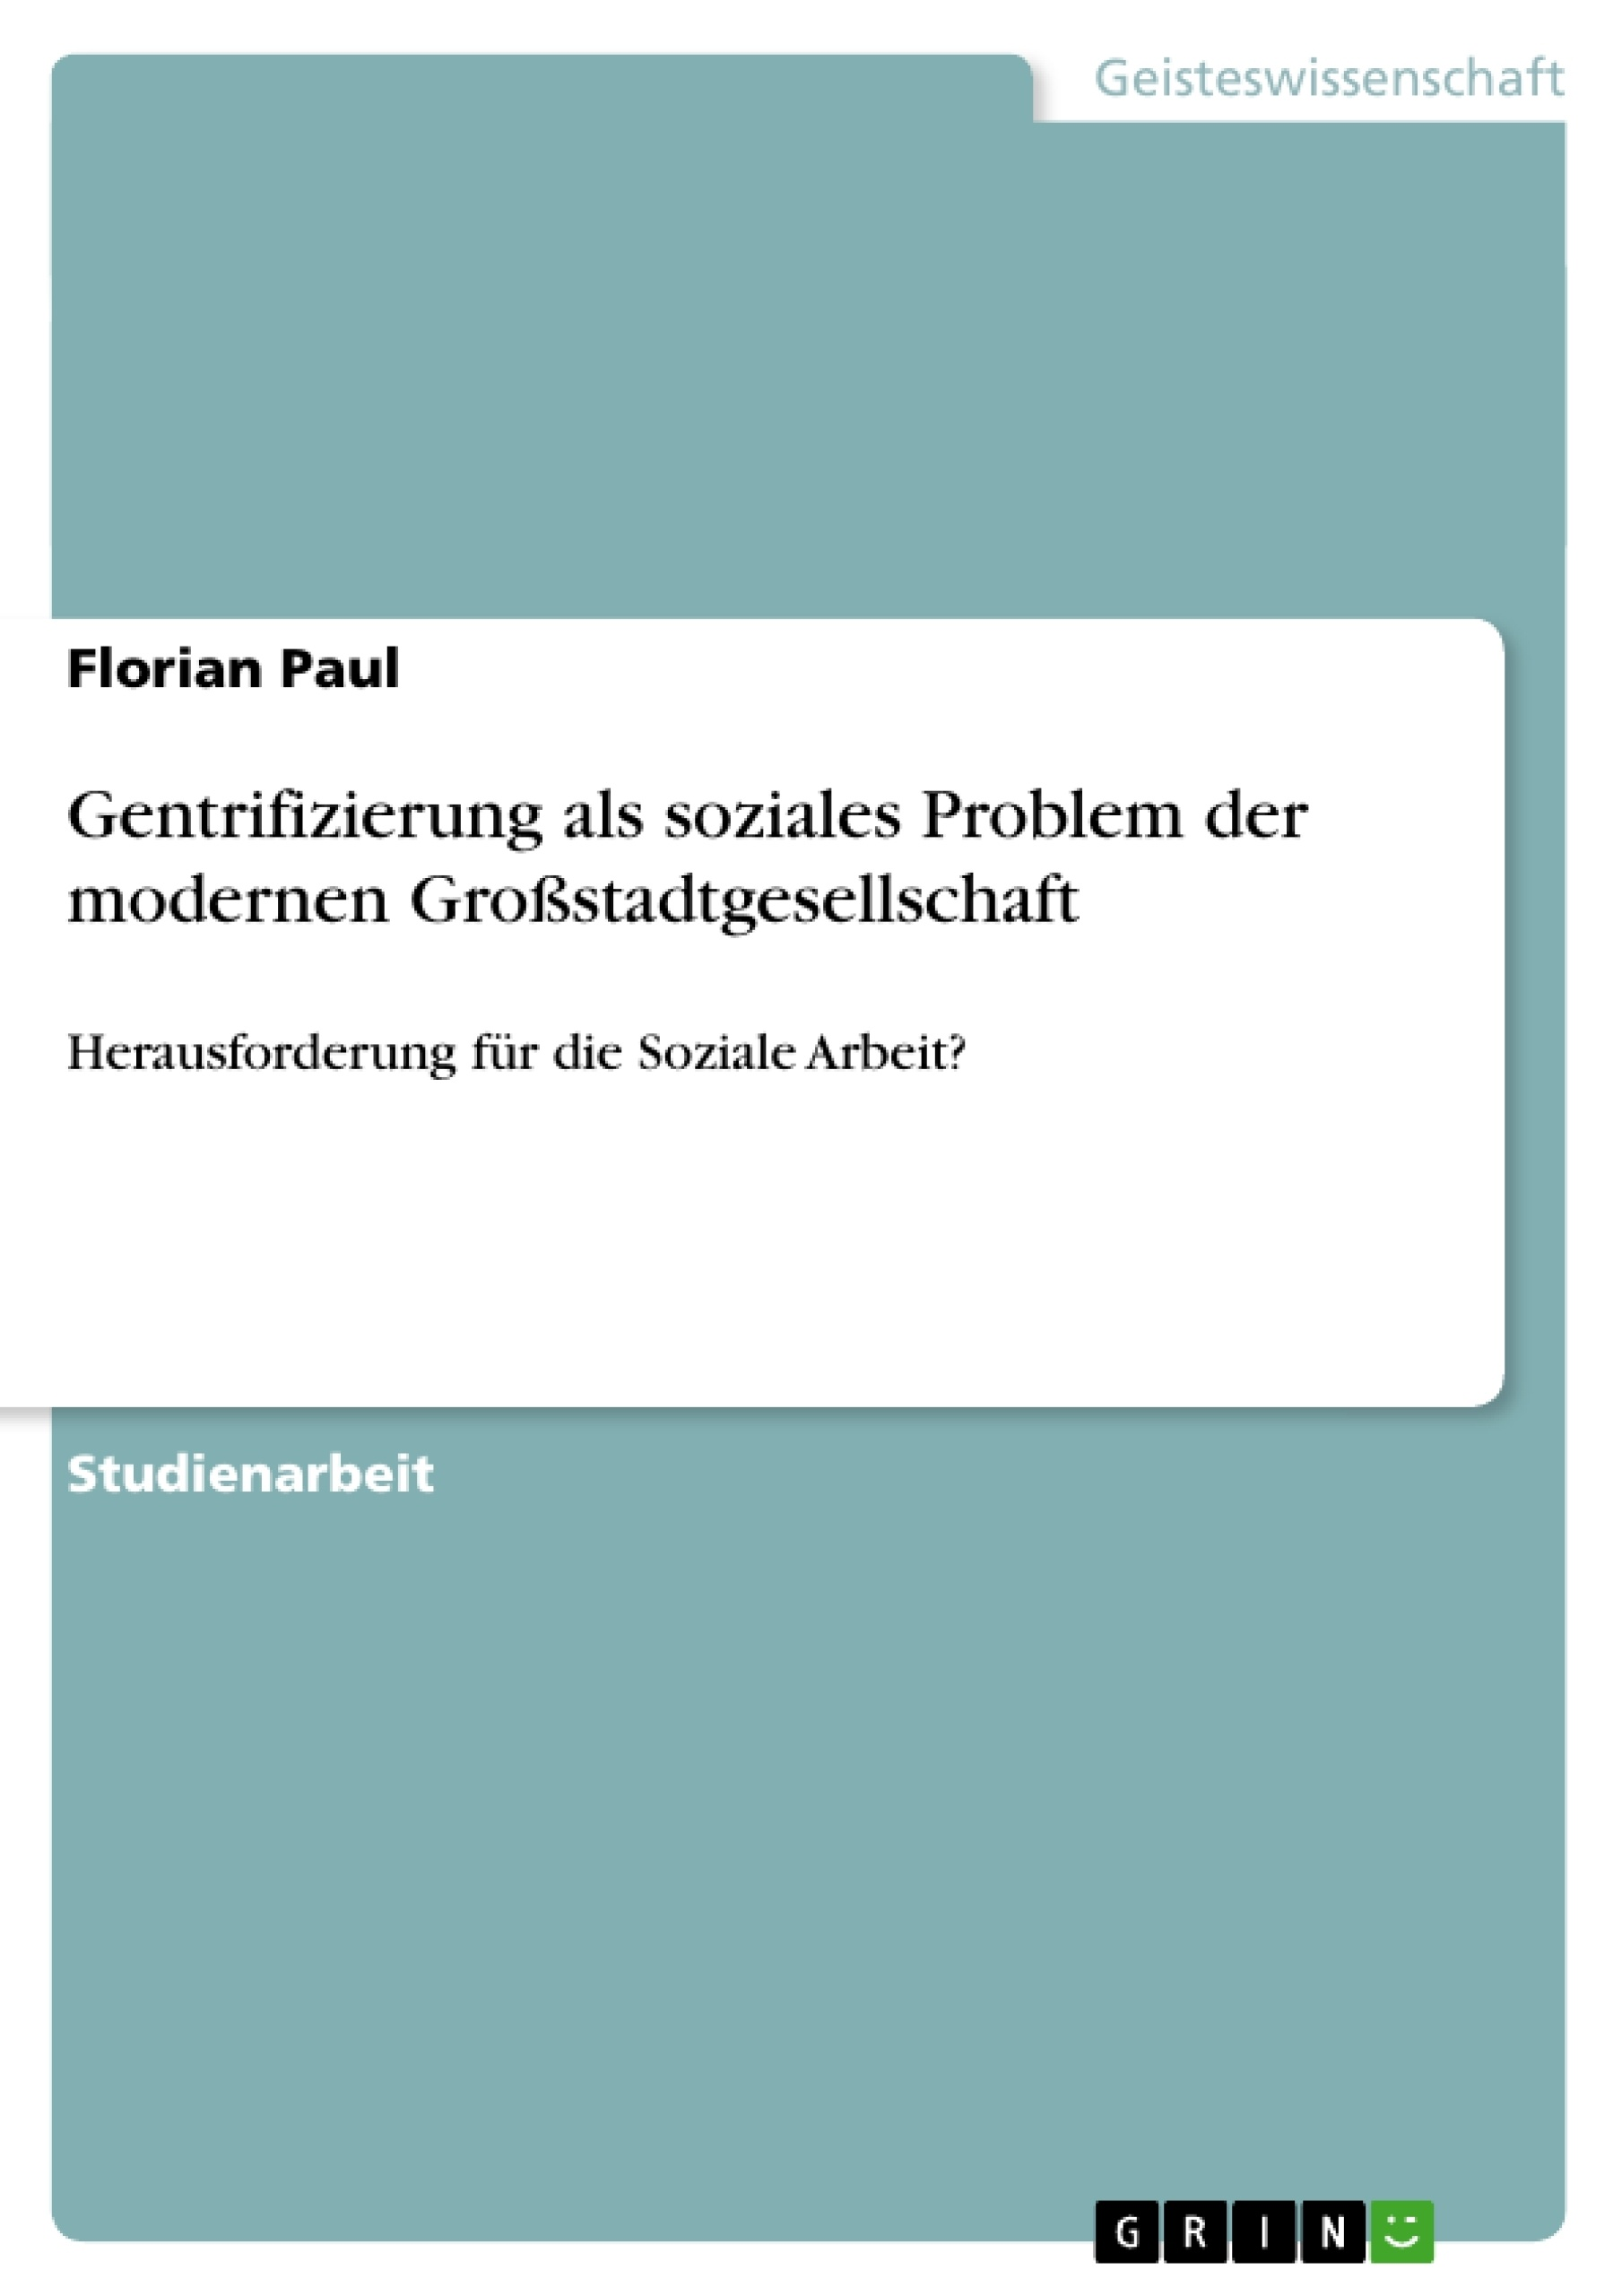 Titel: Gentrifizierung als soziales Problem der modernen Großstadtgesellschaft